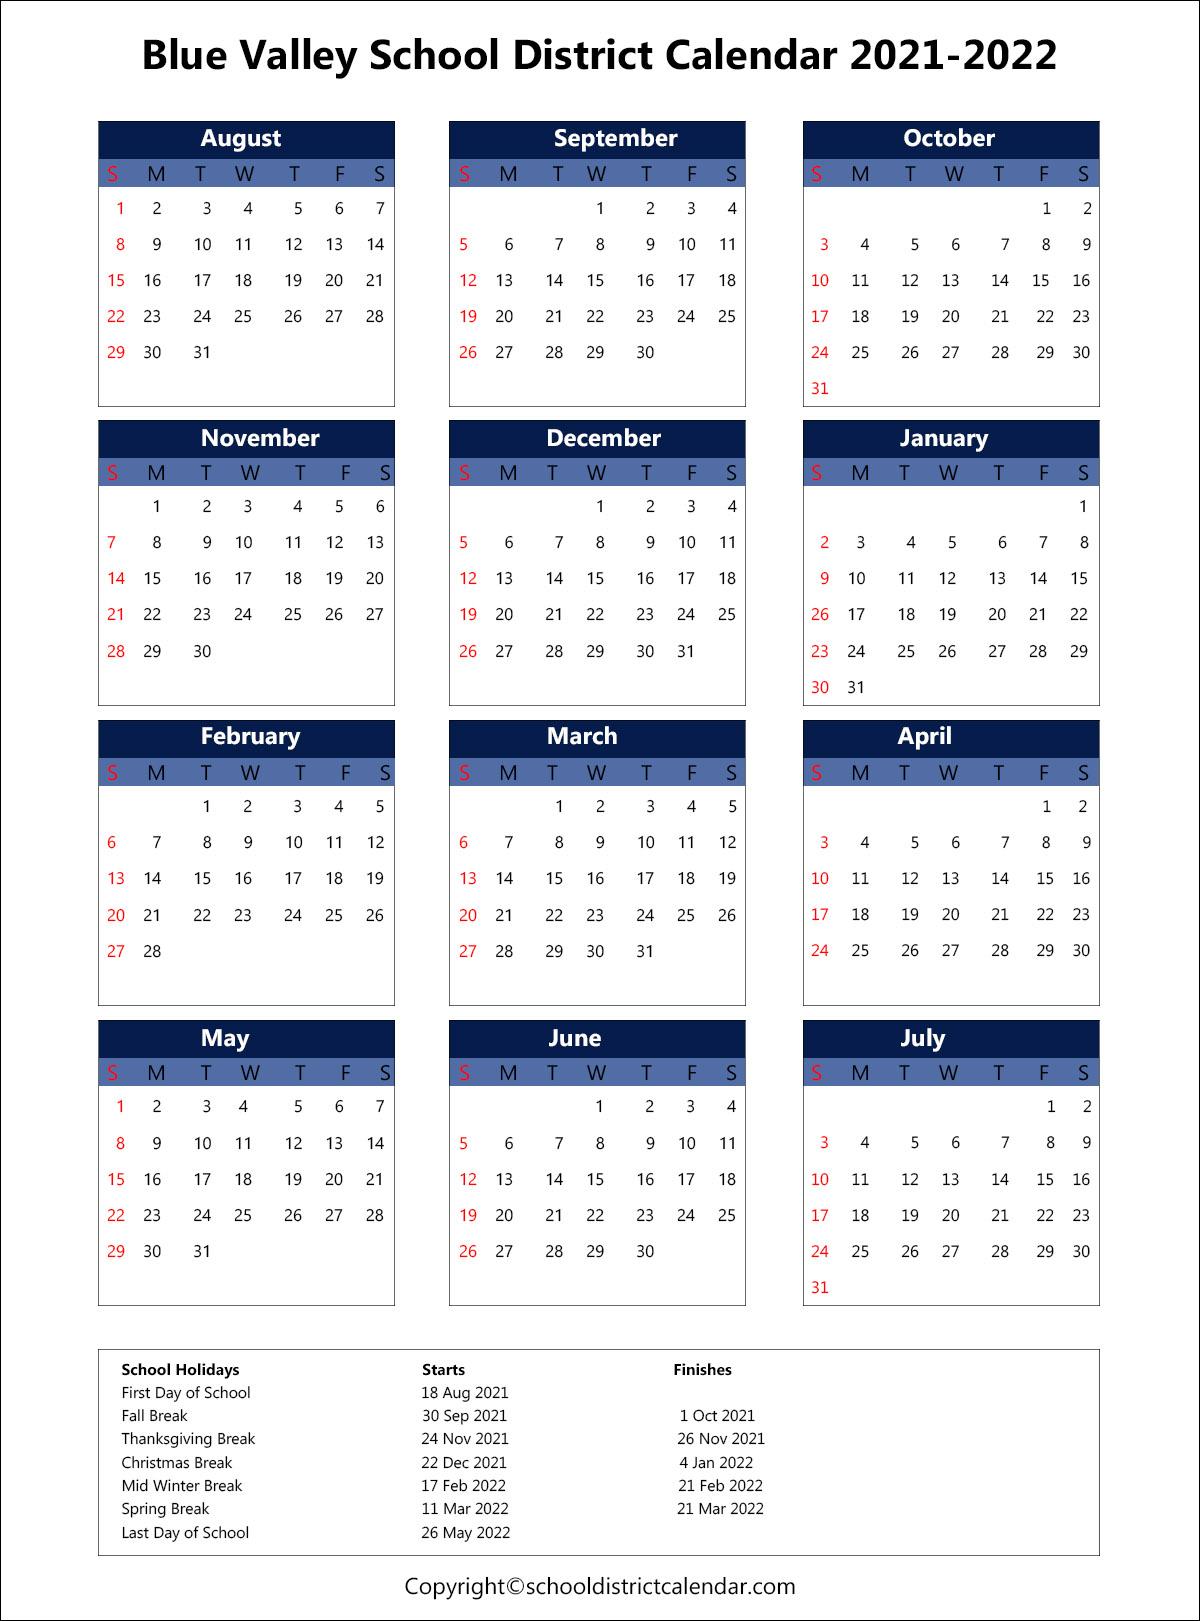 Knox County Schools Calendar 2022.Blue Valley School District Calendar Holidays 2021 2022